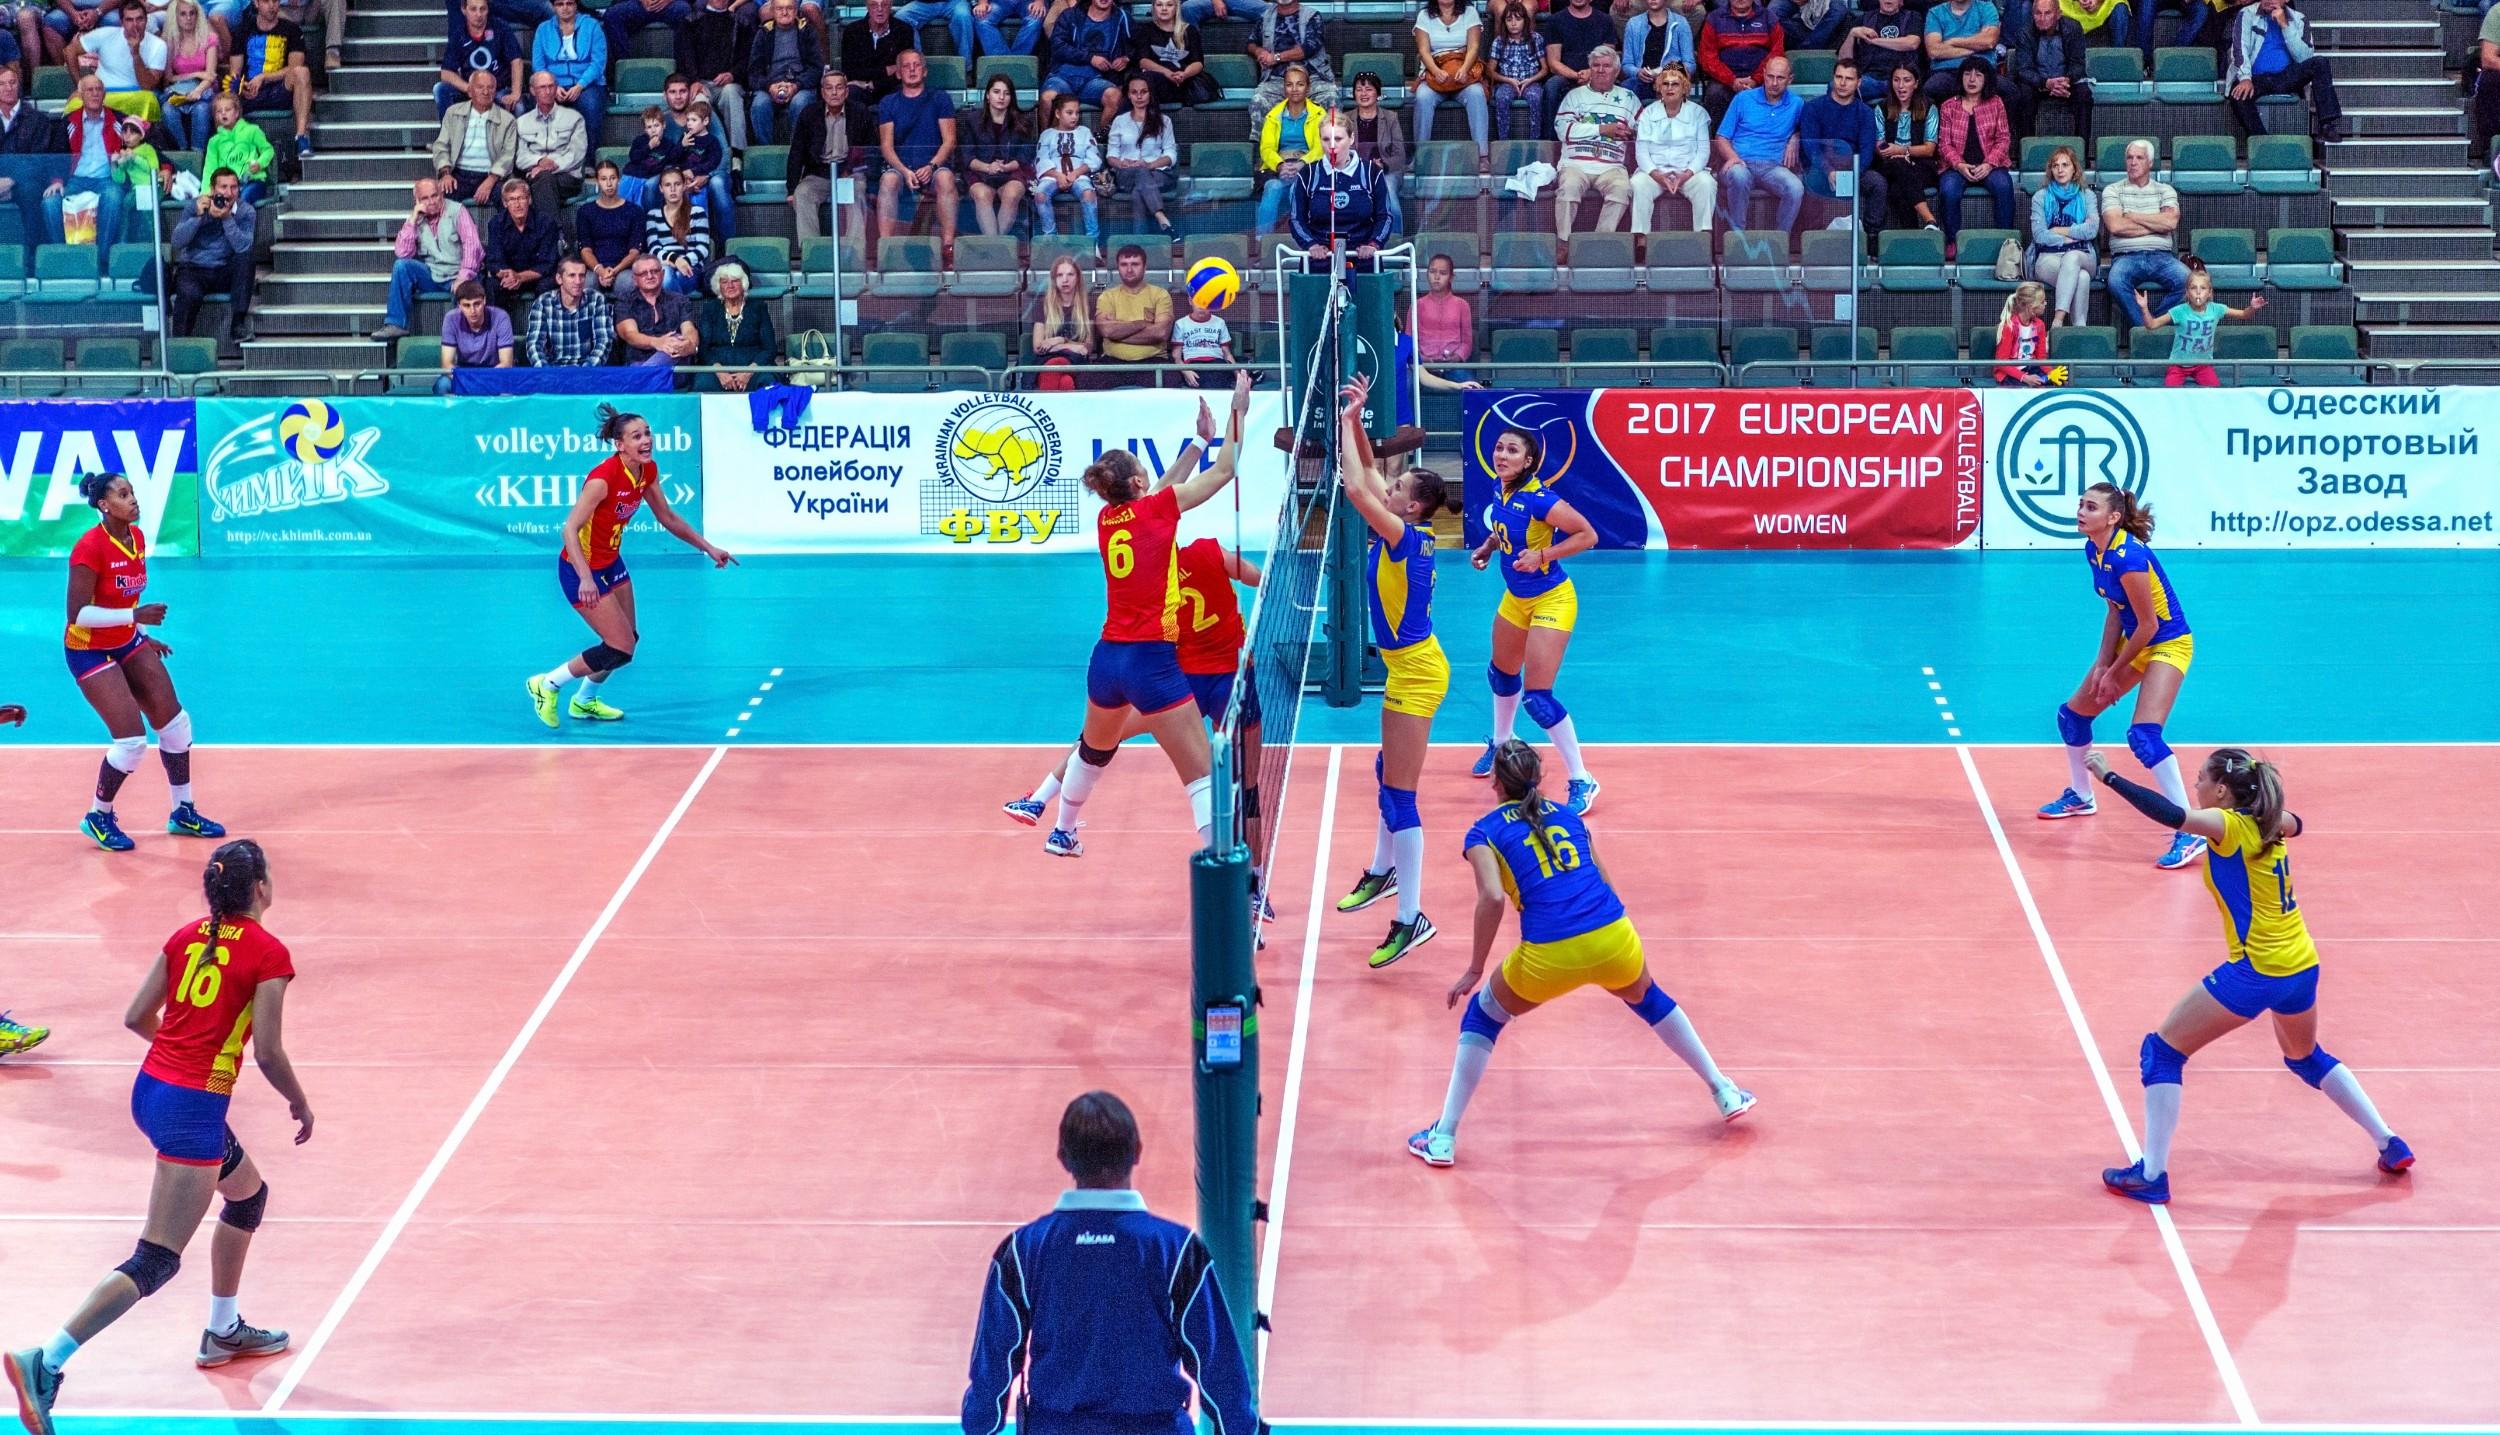 605f2975b8 Esporte  Vôlei. Foto  A Lesik   Shutterstock.com